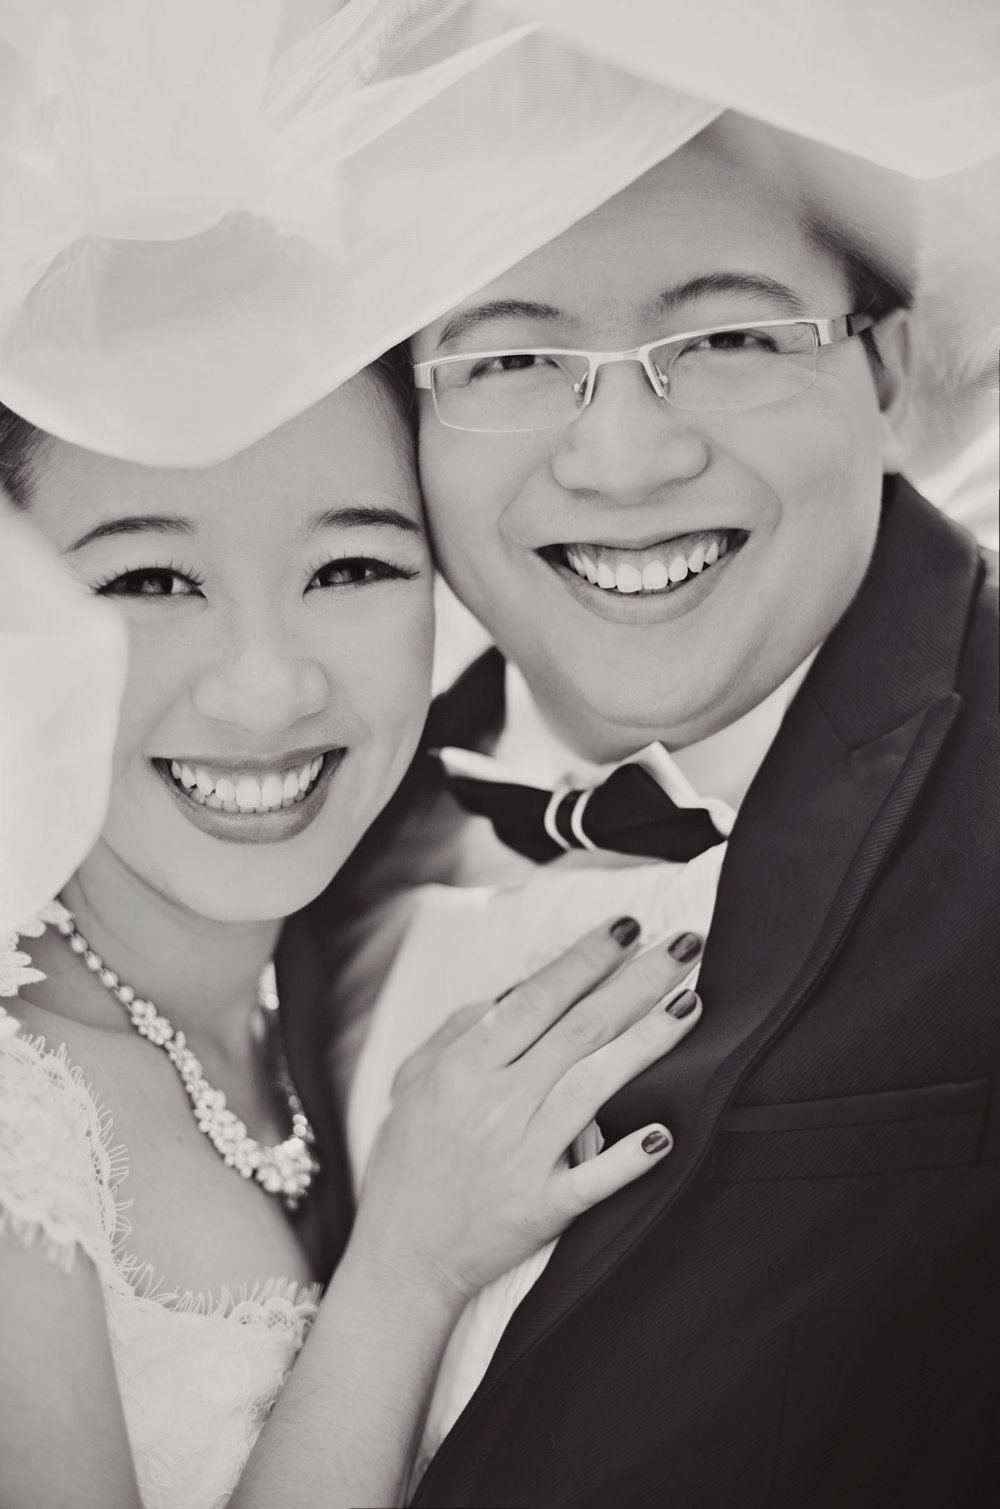 Chris_Hui_婚禮_婚紗照_pre_wedding_photography_best_031_.jpg